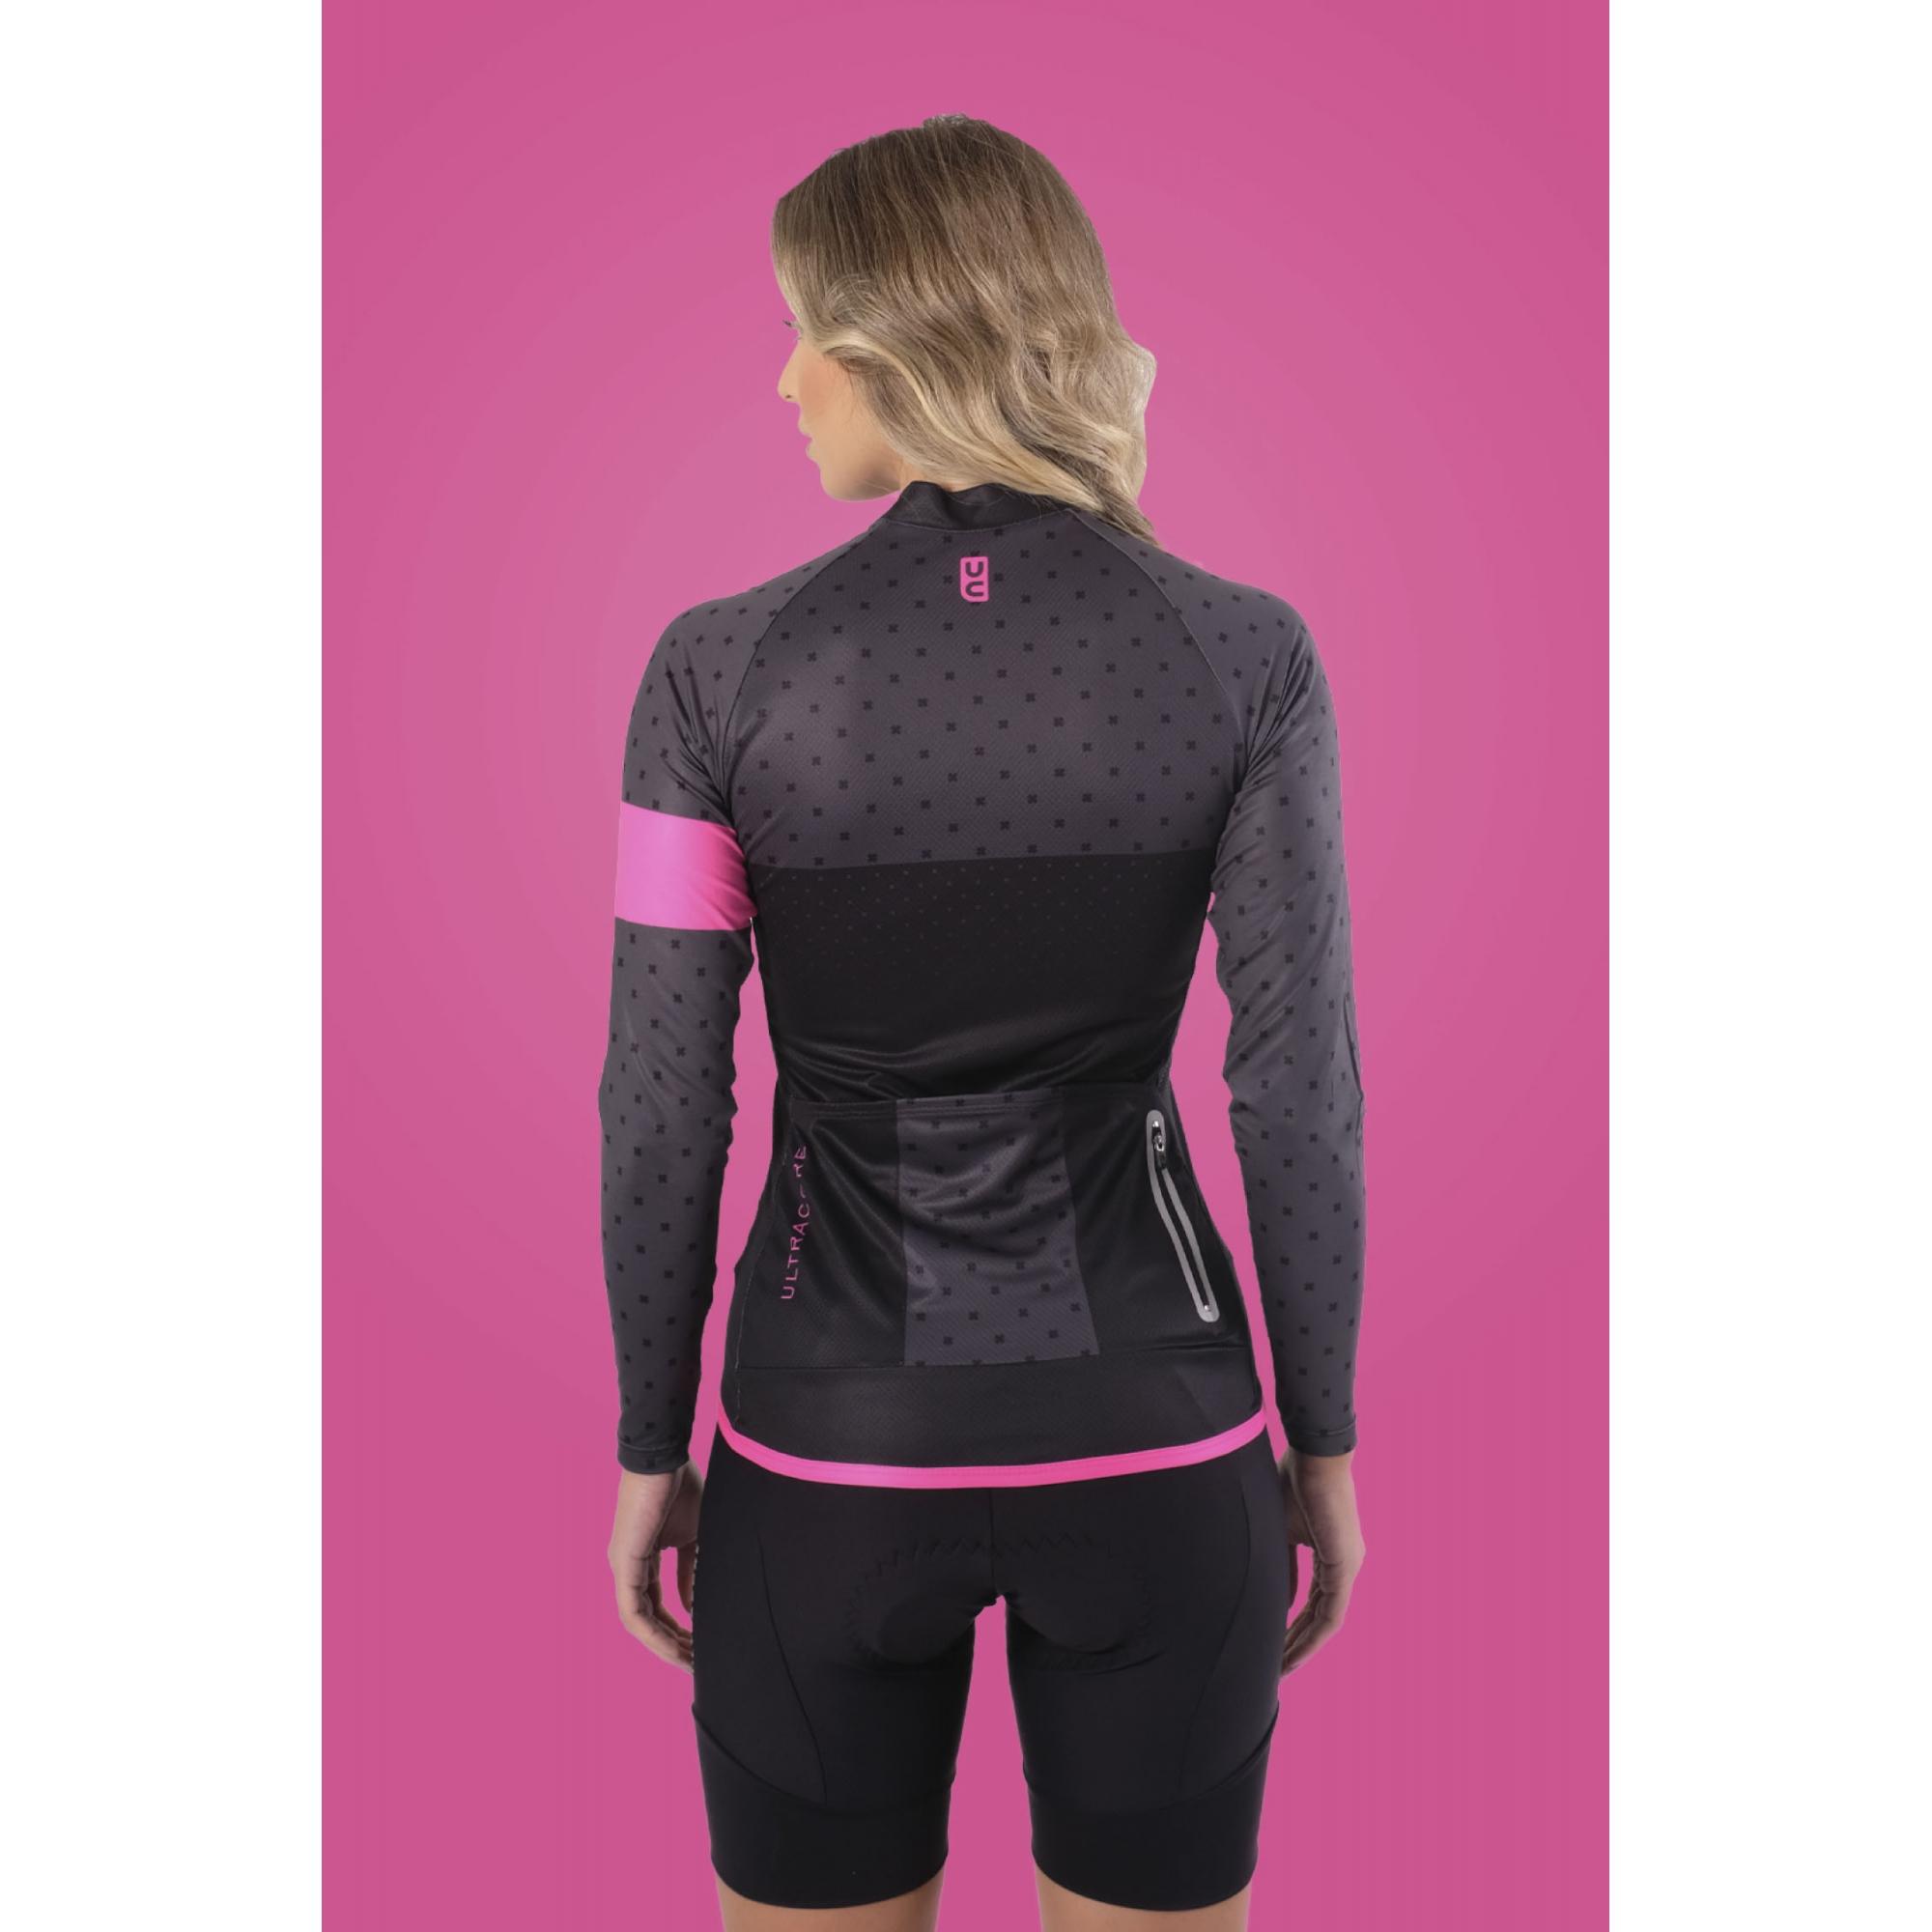 Camisa Feminina Ciclismo Spicy - Ultracore